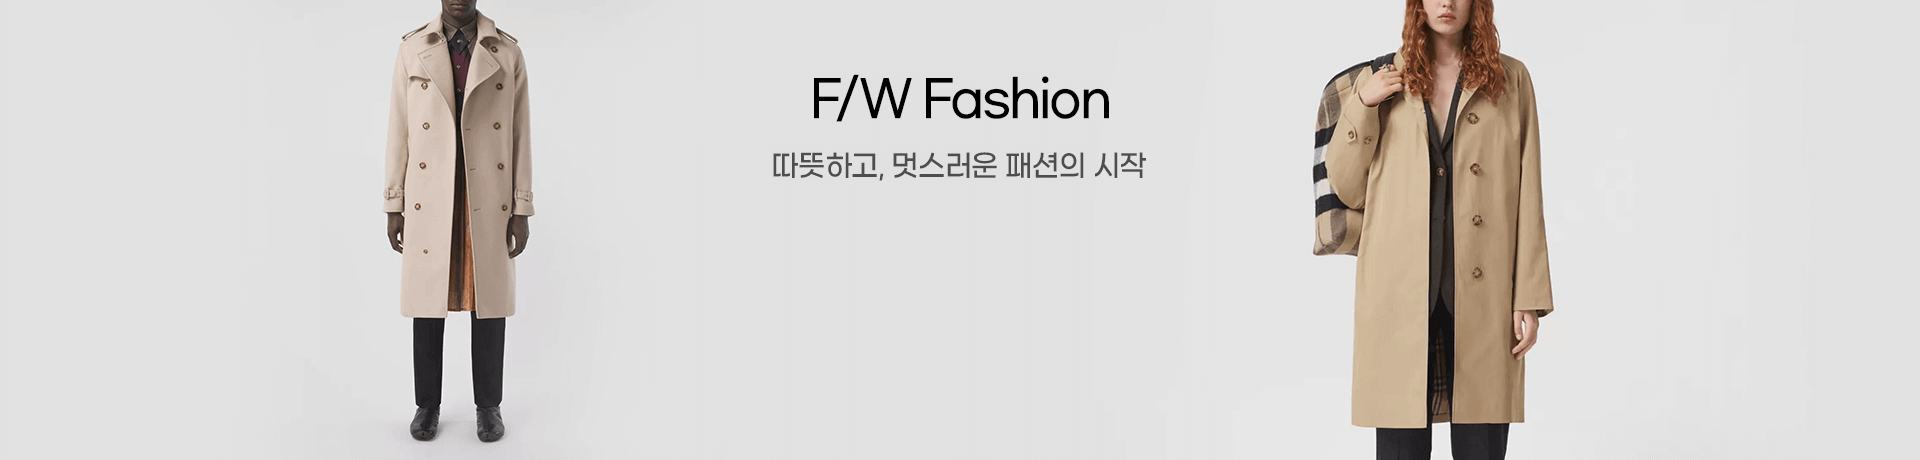 210913_sk_fw-fashion_pc_e2e2e2